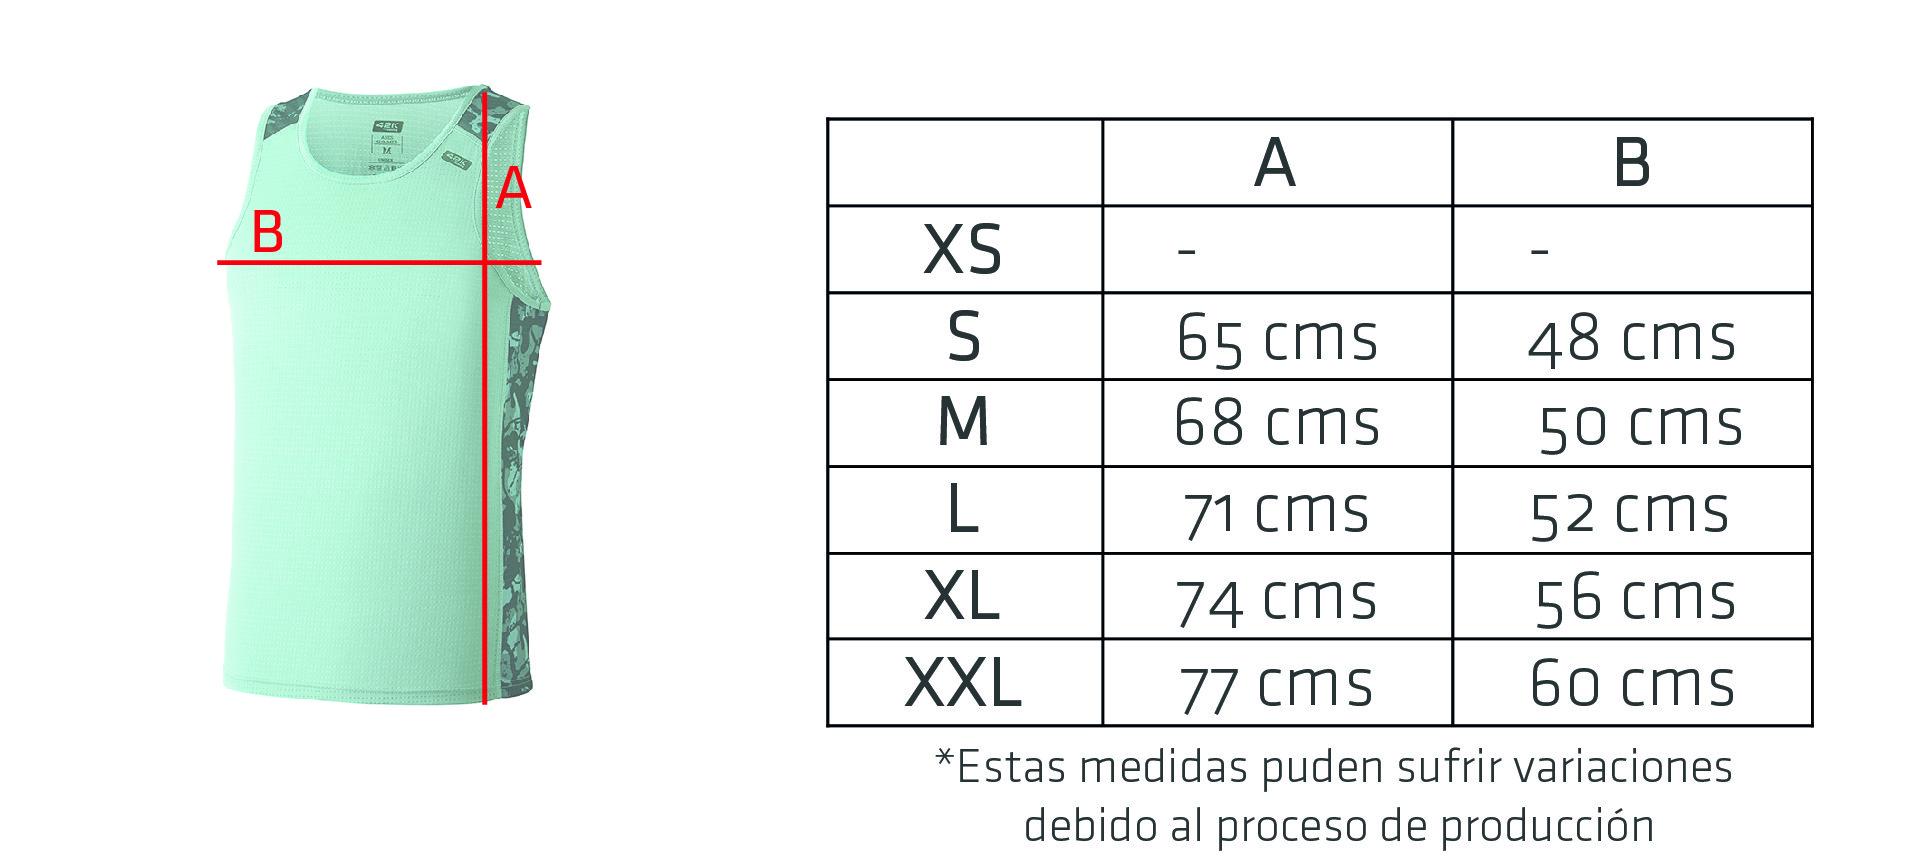 Camiseta Tecnica 42k Ares Summer Man Medidas 1 1